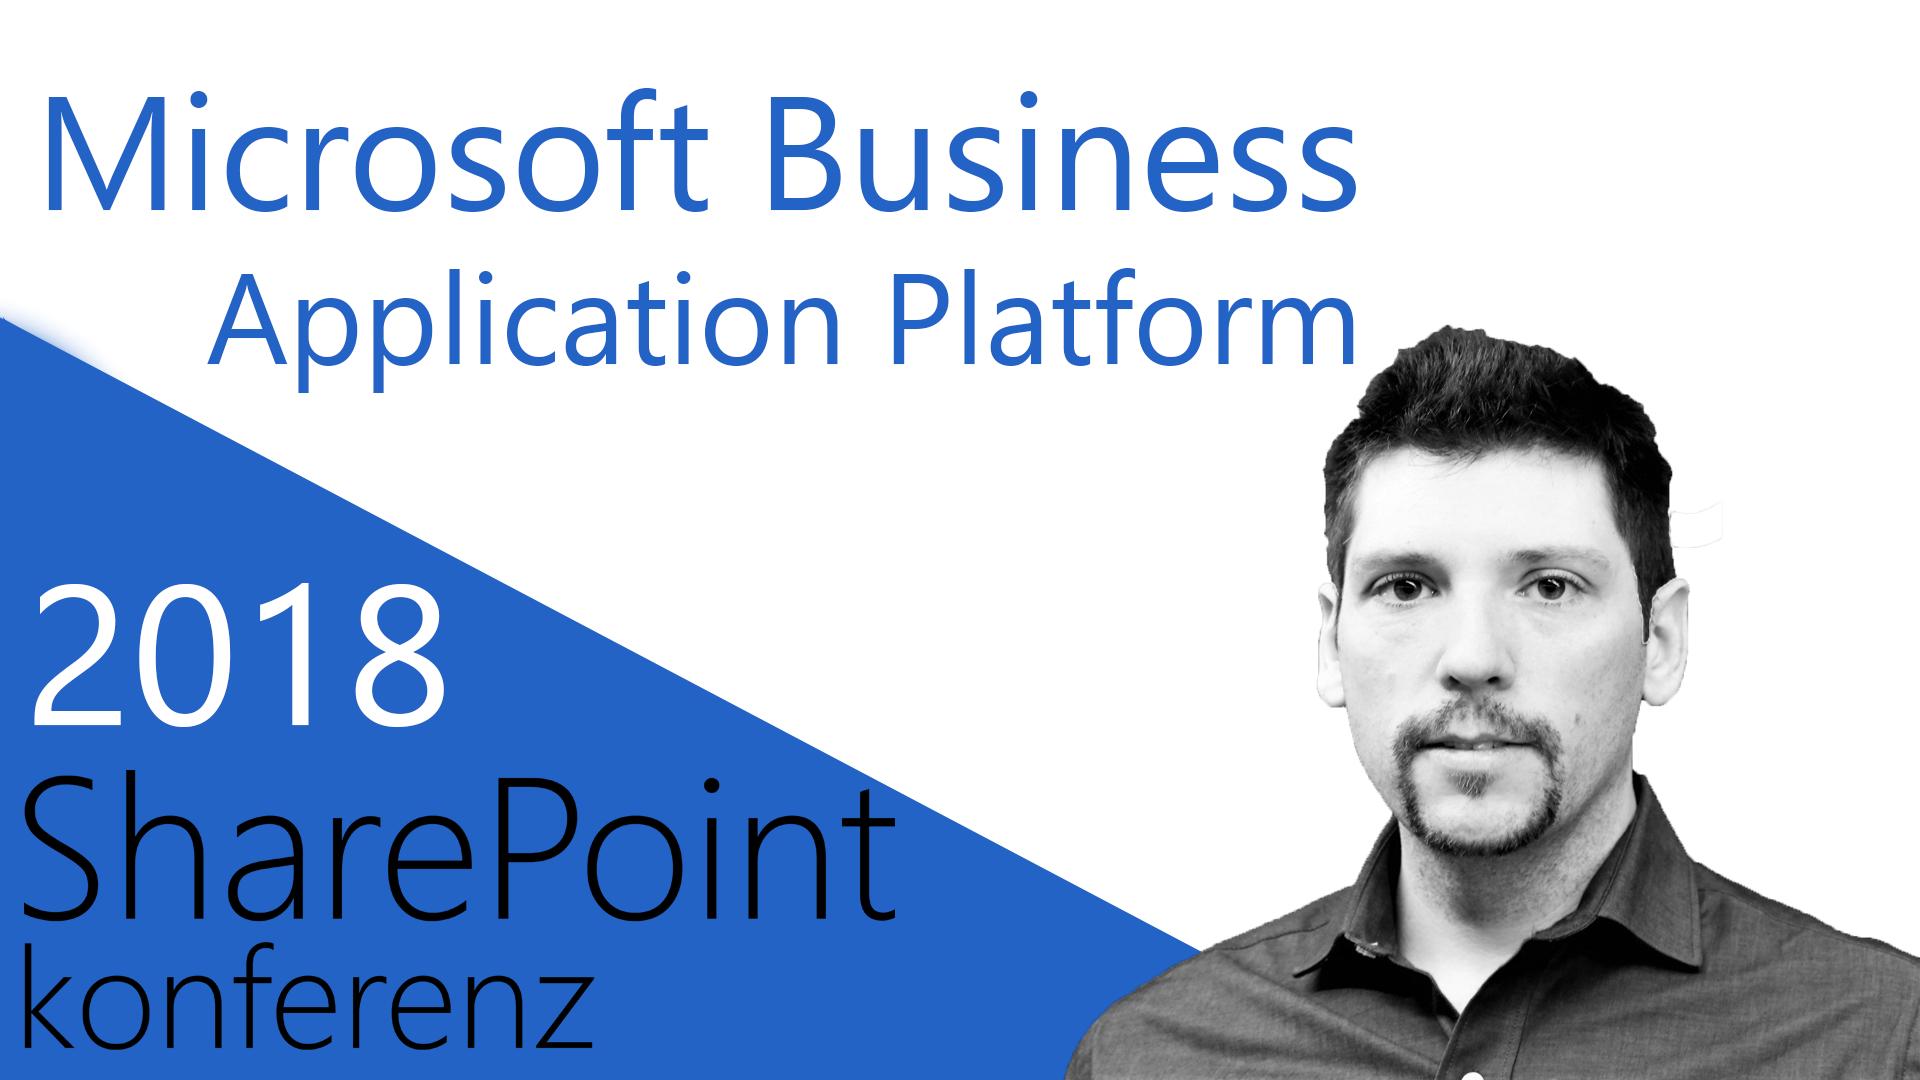 2018/SharePointKonferenz/MicrosoftBusinessApplicationPlatform